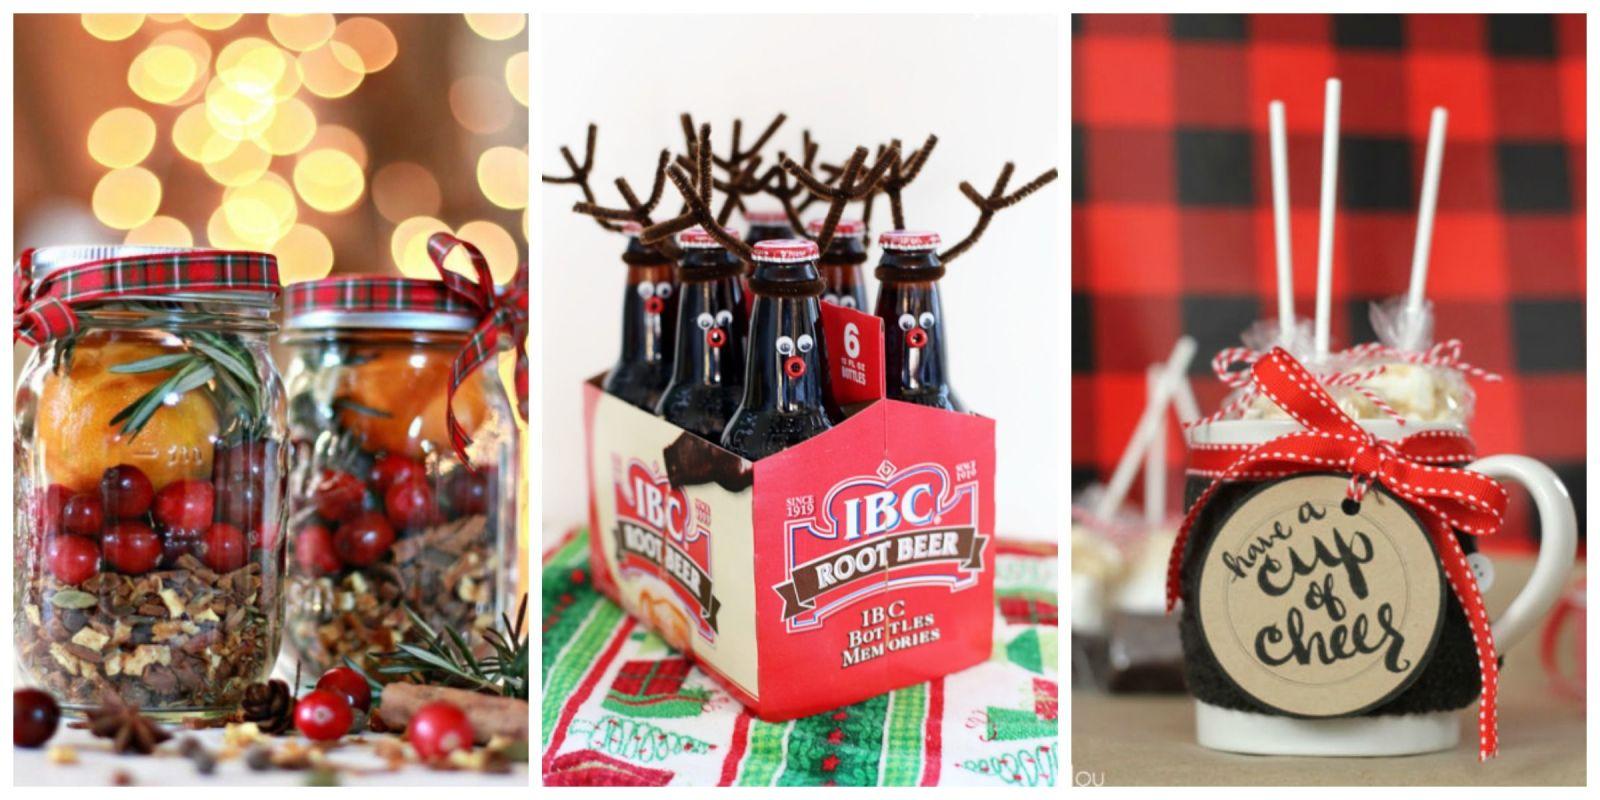 Small Gifts For Christmas | Credainatcon.com